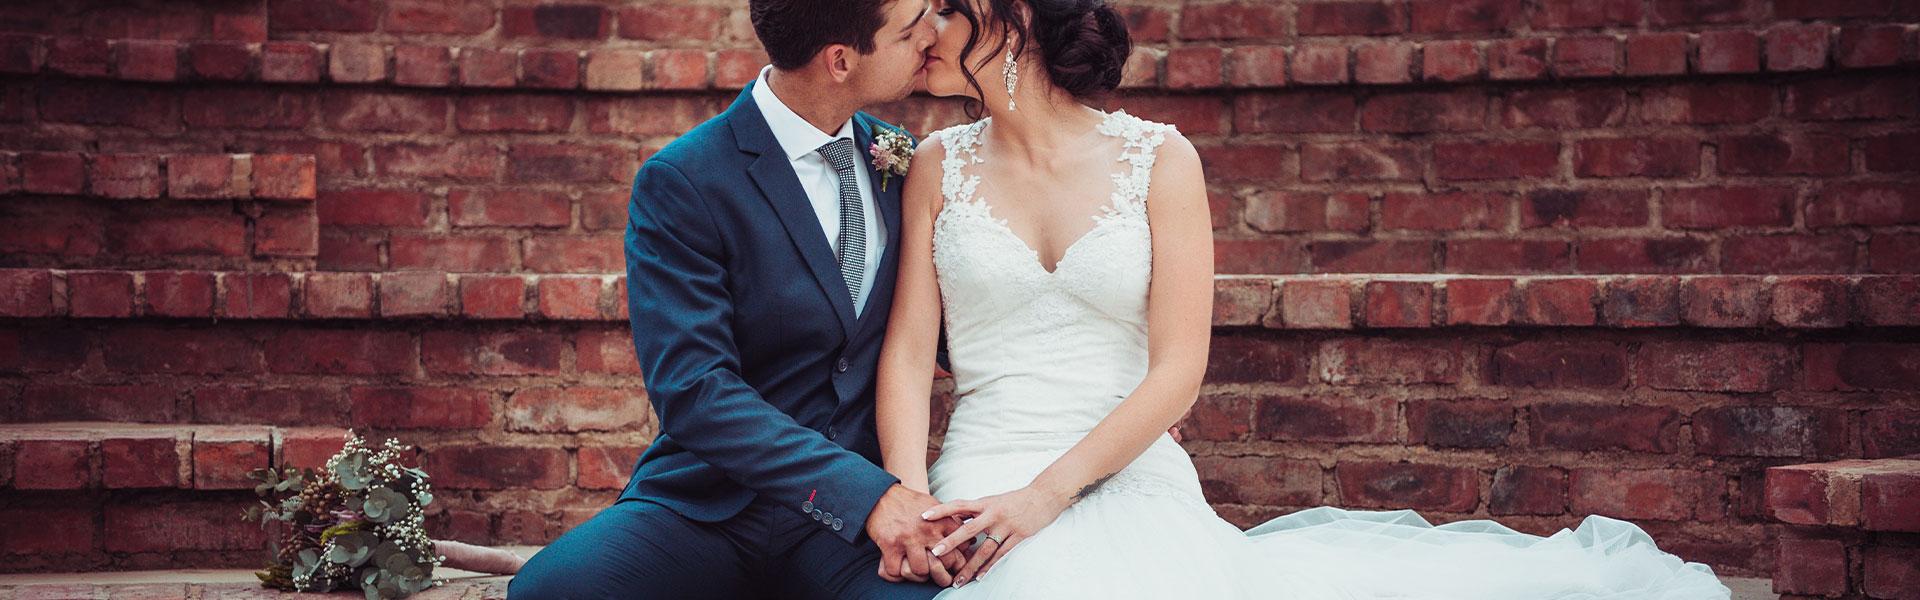 accolades-wedding-photo